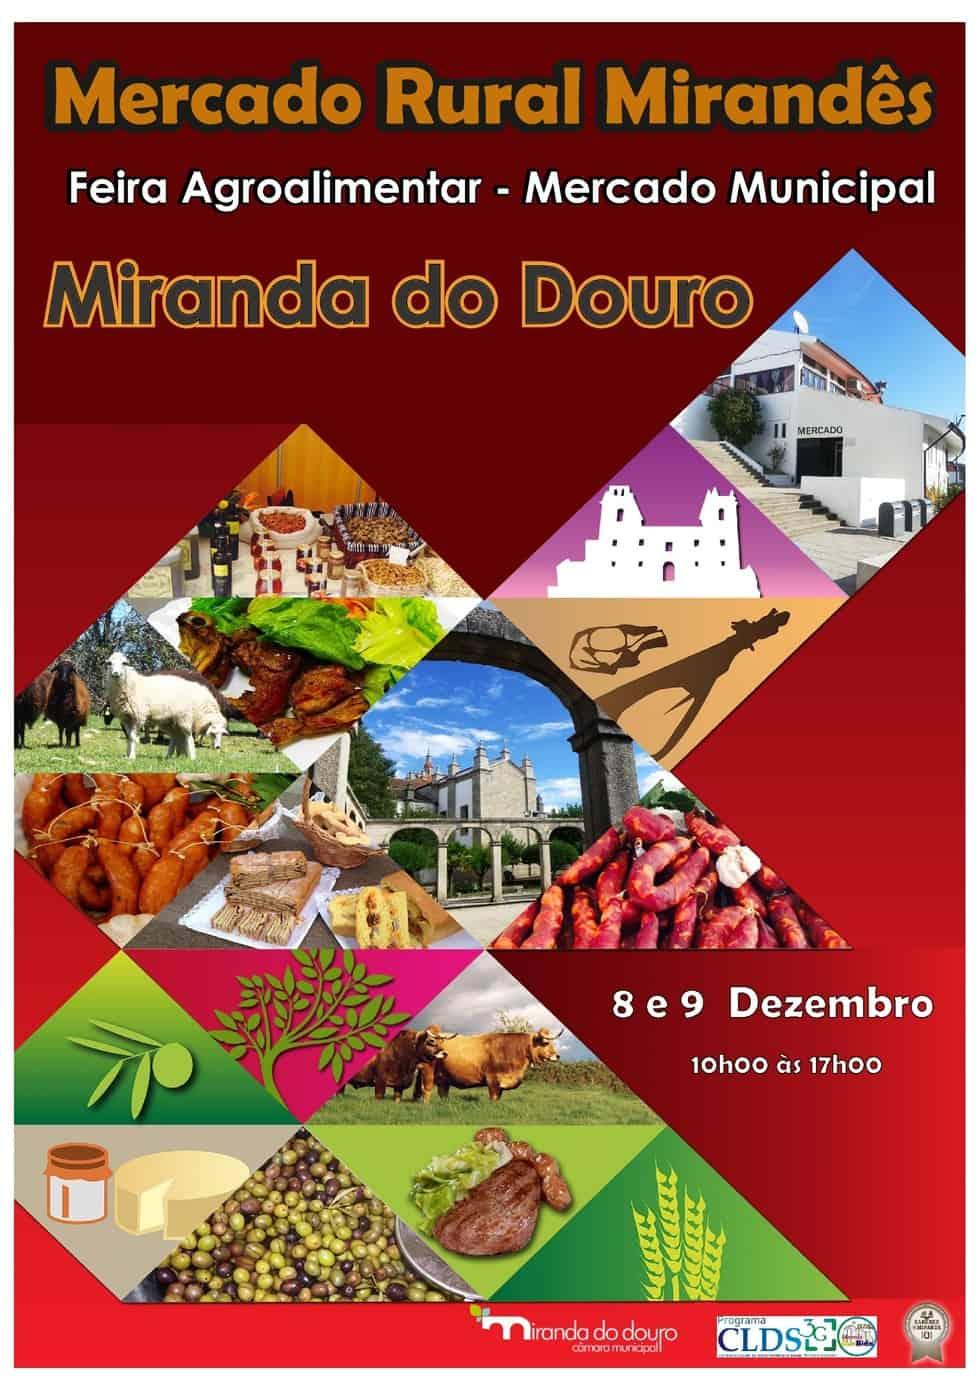 MERCADO RURAL MIRANDÊS – FEIRA AGROALIMENTAR